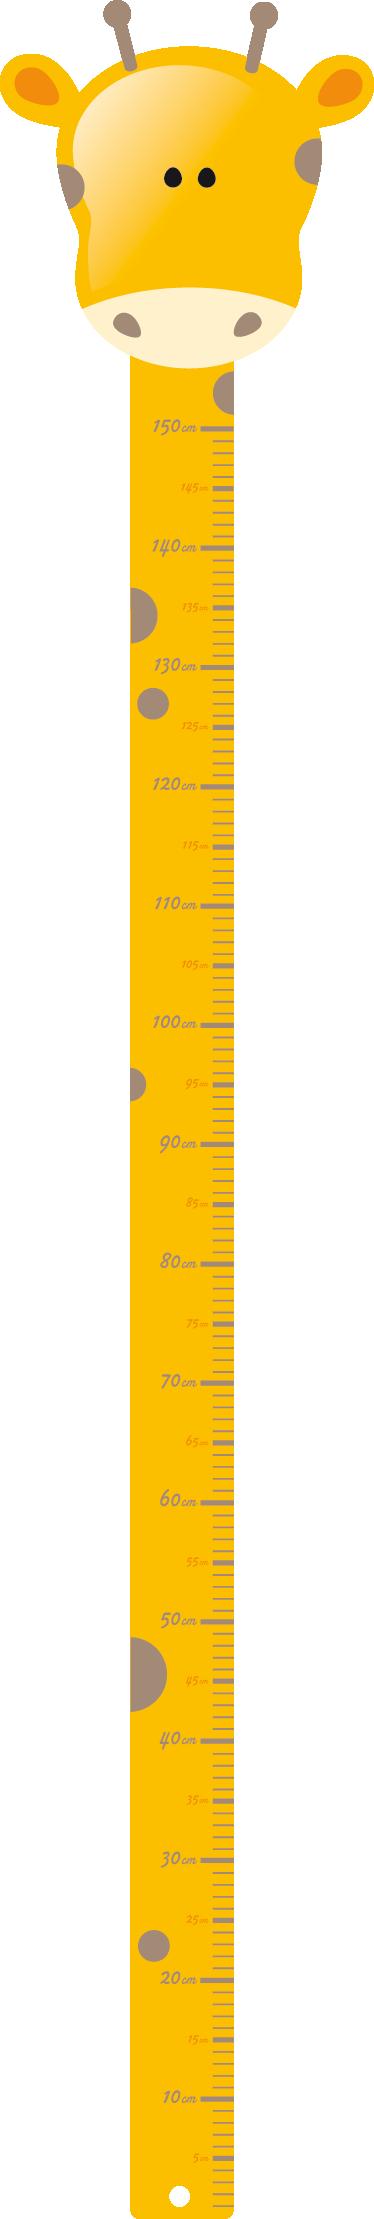 TenStickers. 长颈鹿高度图孩子贴纸. 一个创意的长颈鹿墙贴,以衡量你孩子的身高!完美的贴花来装饰你孩子的房间。